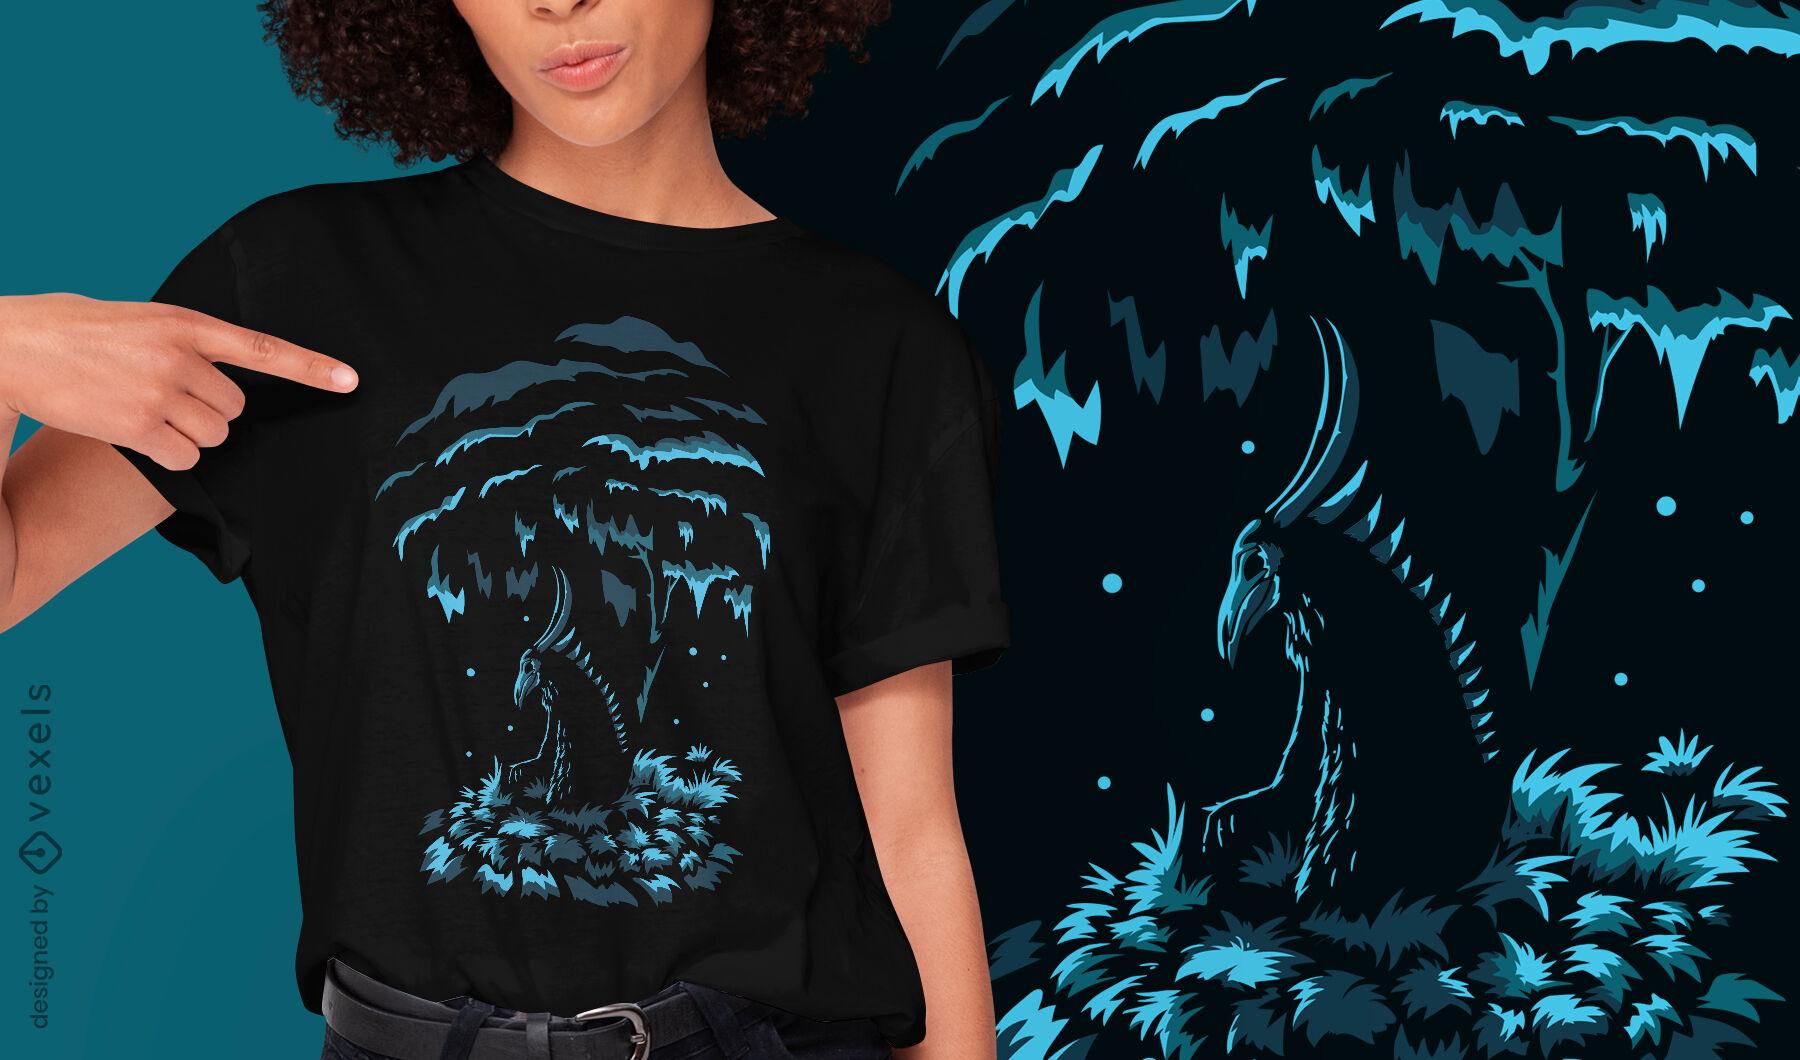 Dark creature demon horns t-shirt design